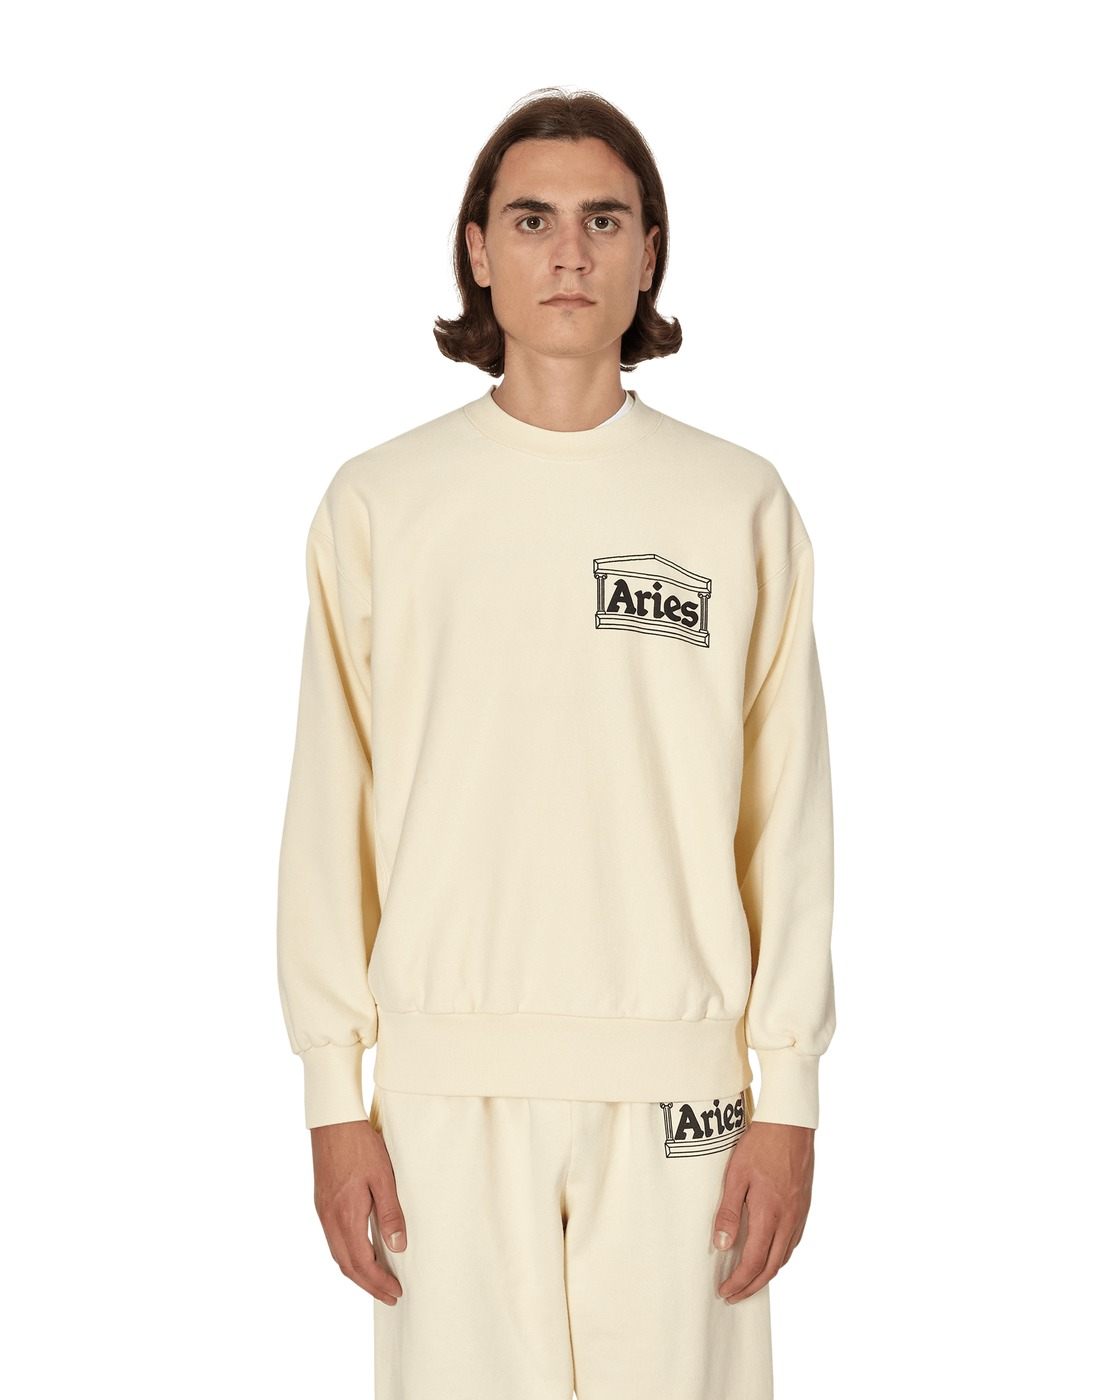 Aries Premium Temple Crewneck Sweatshirt Alabaster